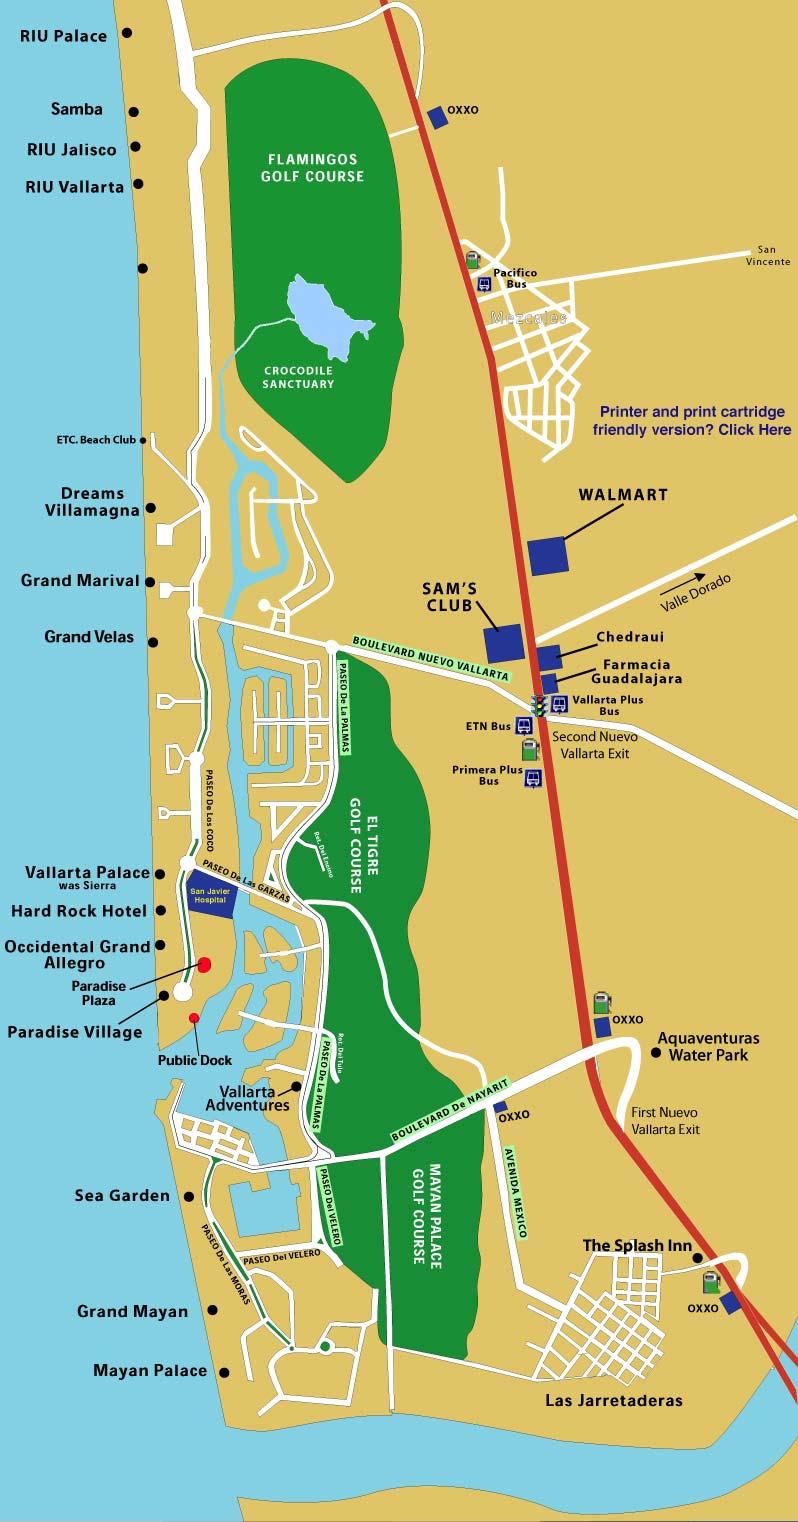 Puerto Vallarta Hotel Map : puerto, vallarta, hotel, Nuevo, Vallarta